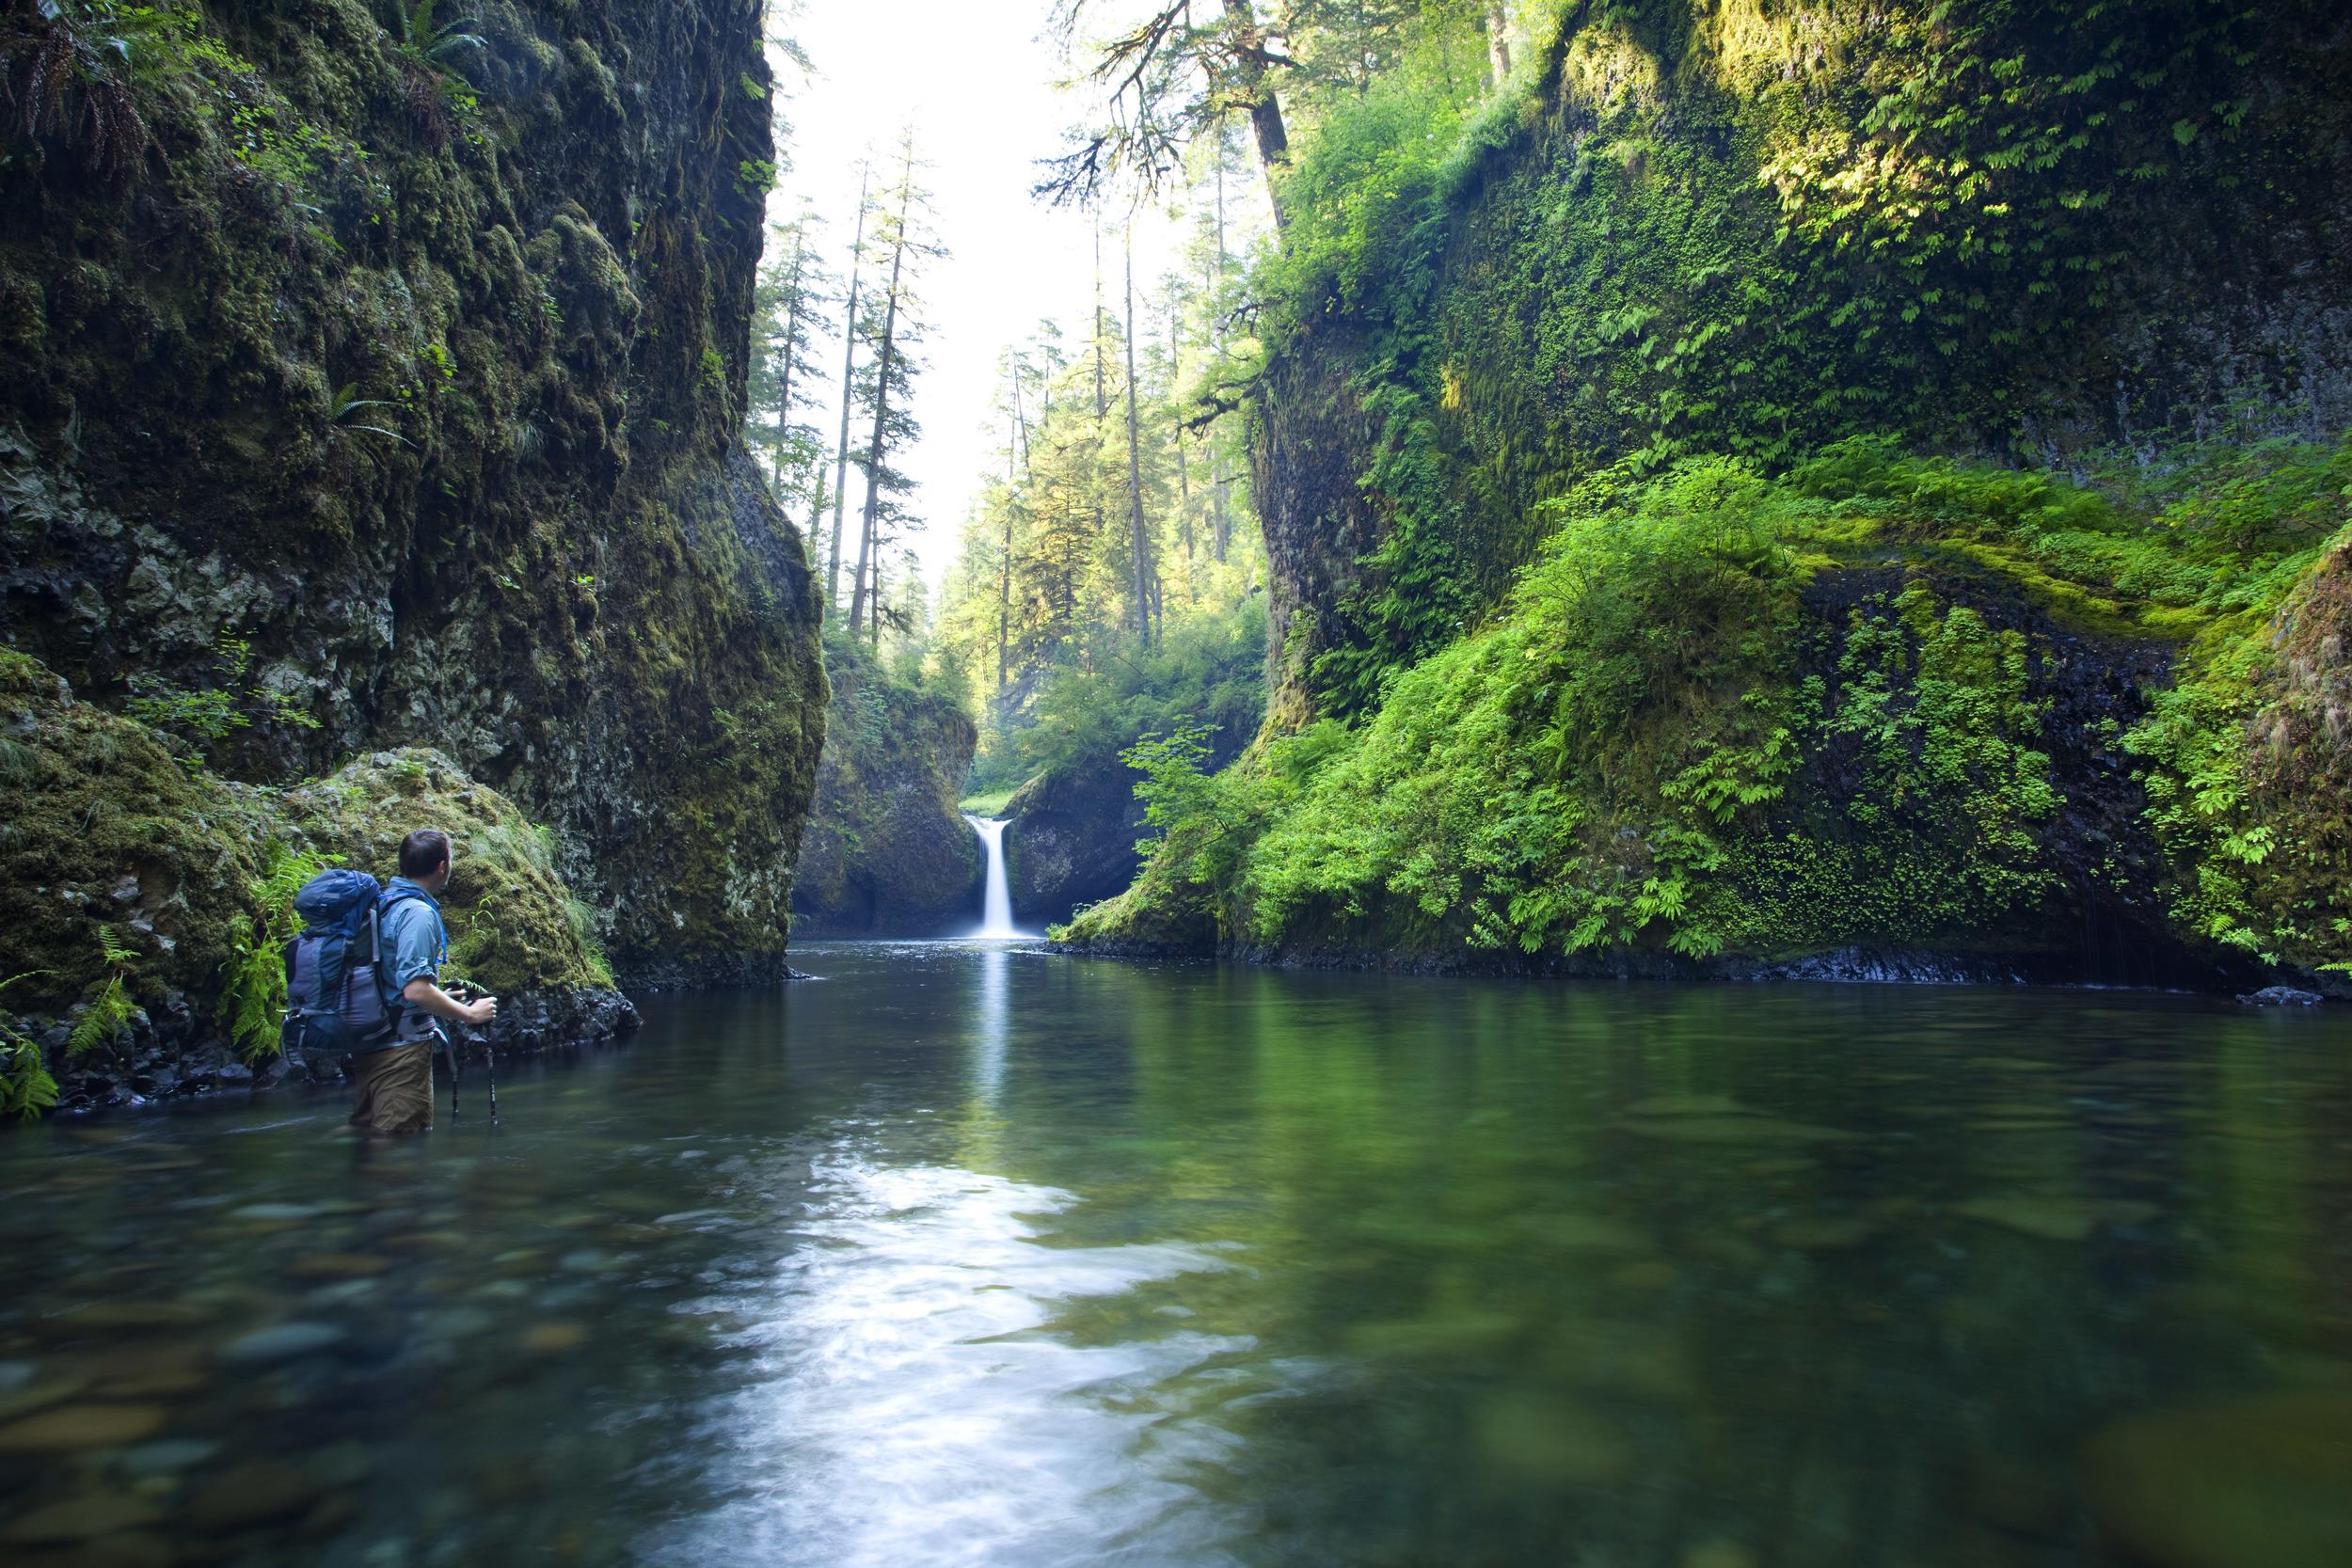 dcollierphoto_SID3090_eagle_creek_trail_fullres.jpg